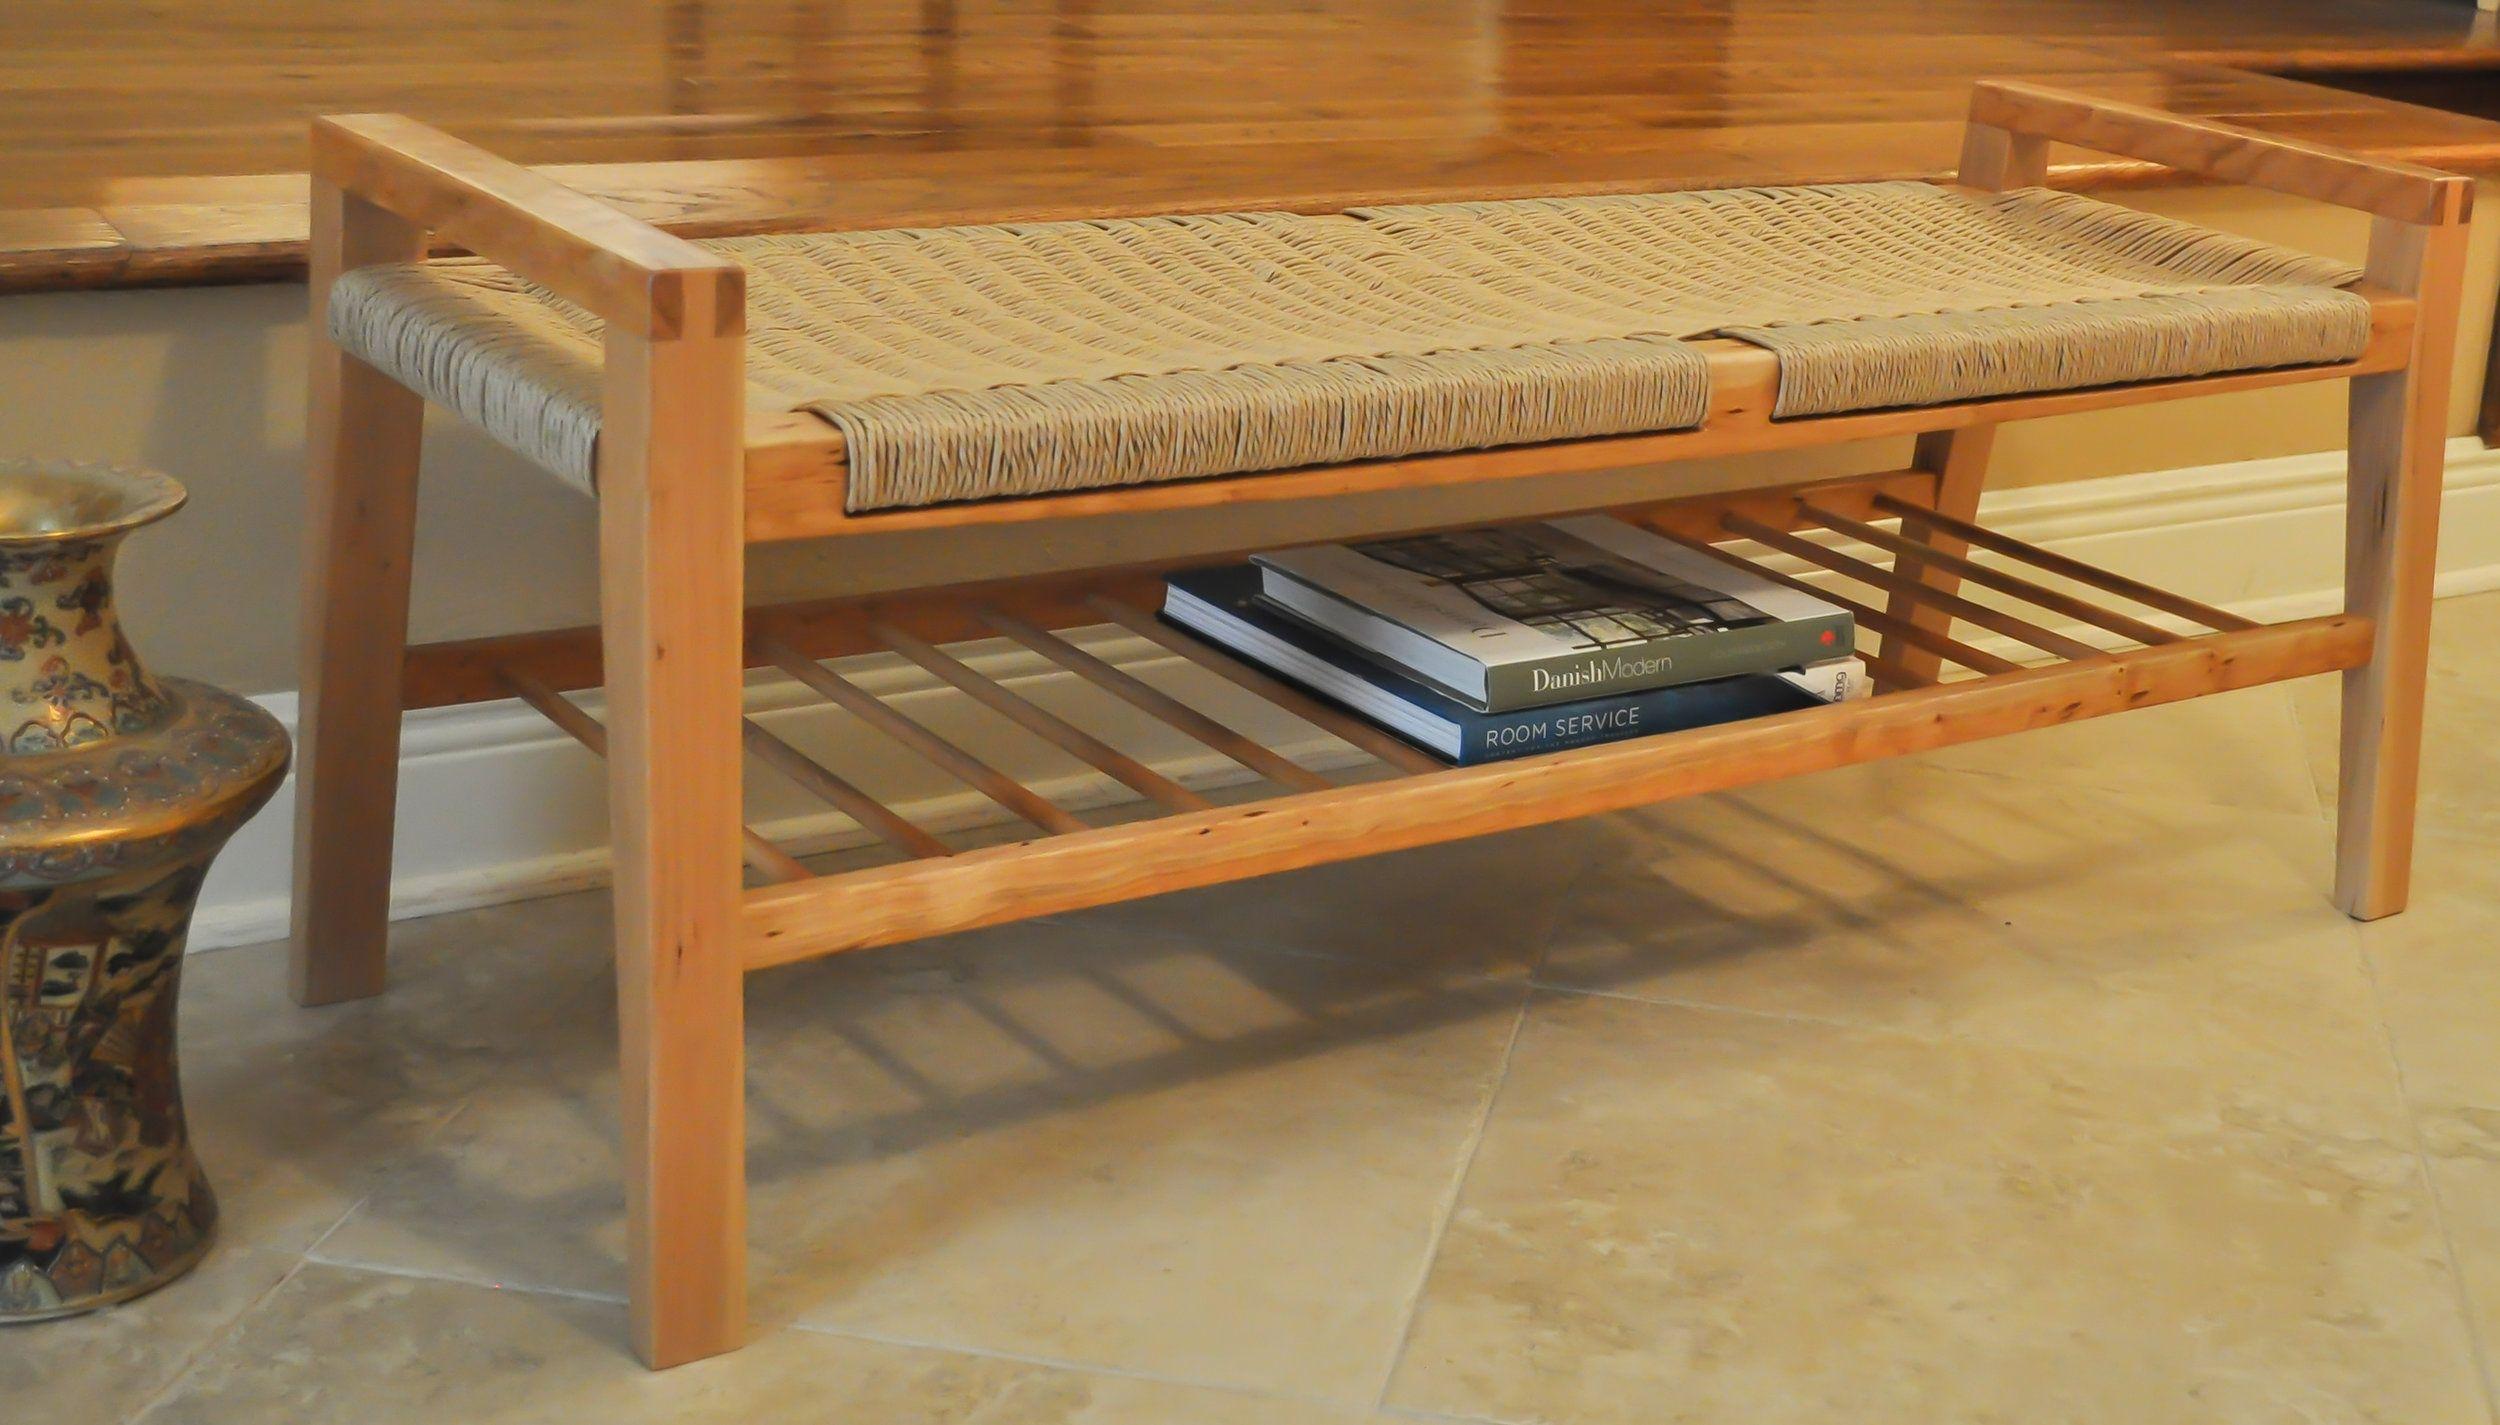 Sutton Bench With Shelf Sutton Projekt Furniture Maker Honolulu Hawai I Modern Wood Bench Danish Cord Modern Wood Furniture